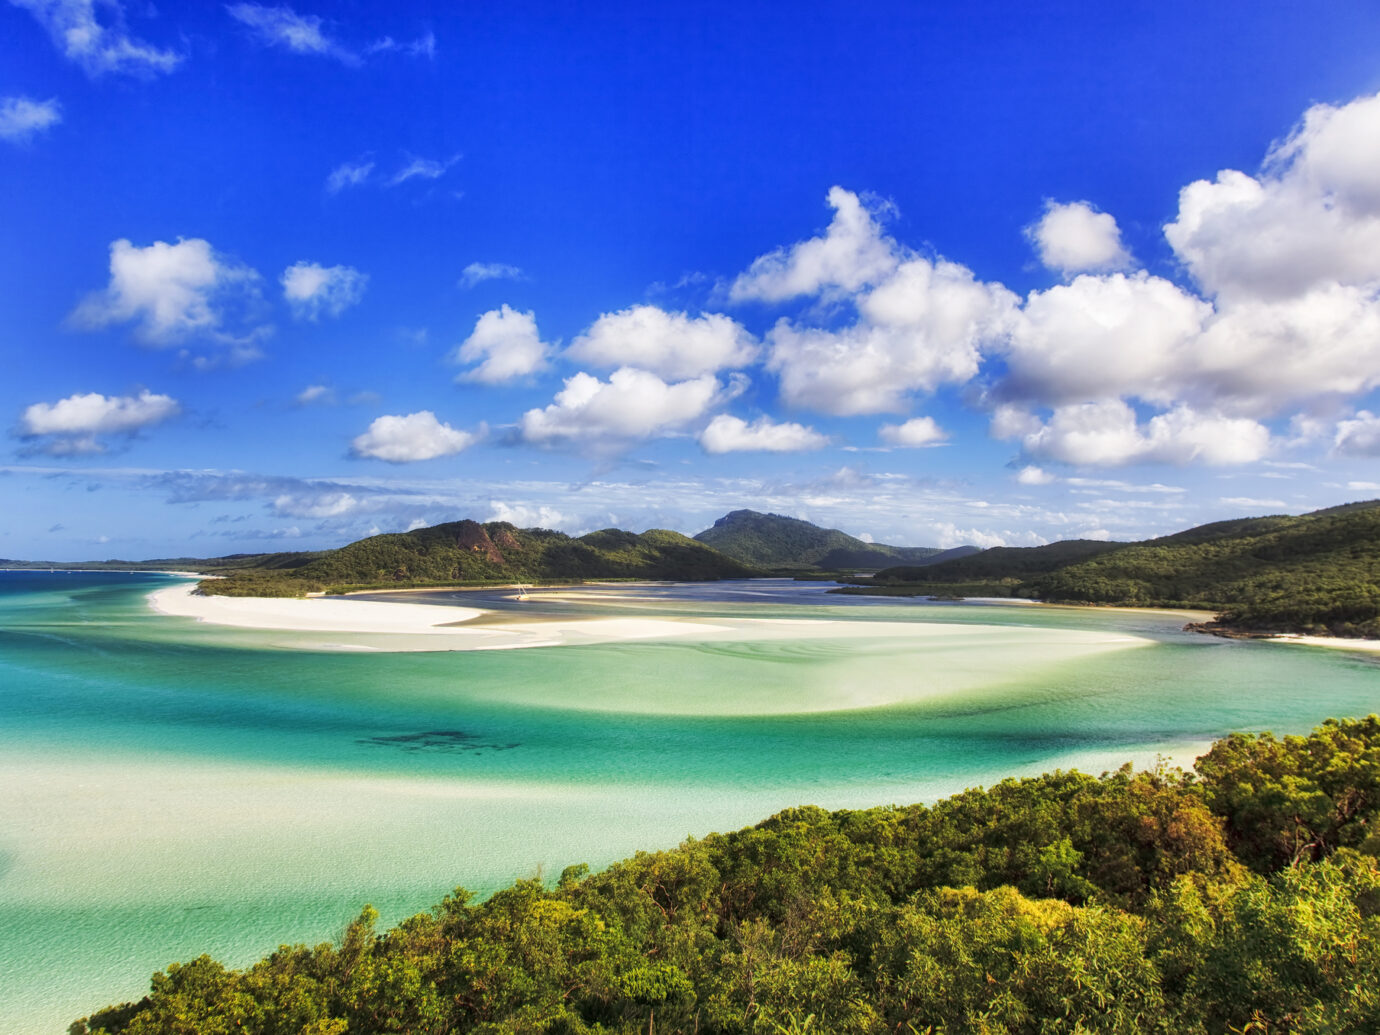 Whitehaven beach on Whitsundays islands